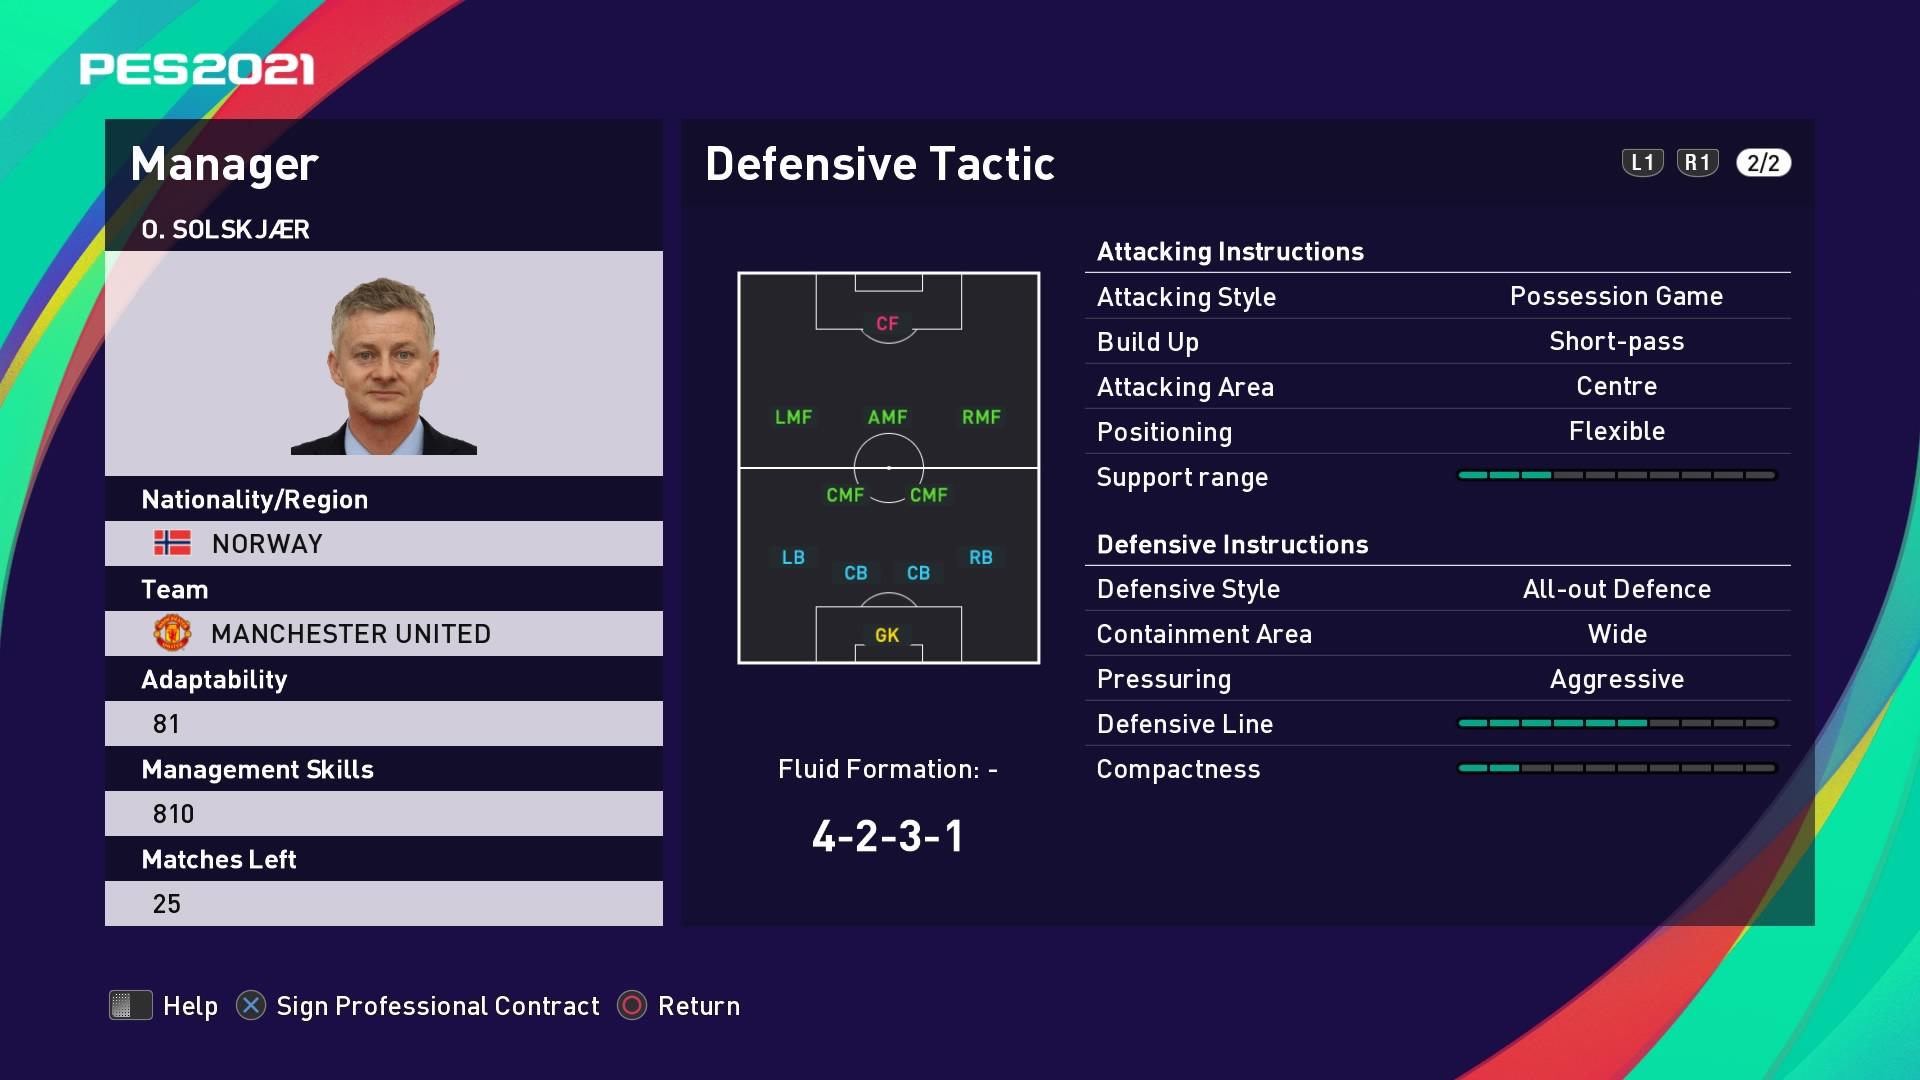 O. Solskjaer (2) (Ole Gunnar Solskjær) Defensive Tactic in PES 2021 myClub